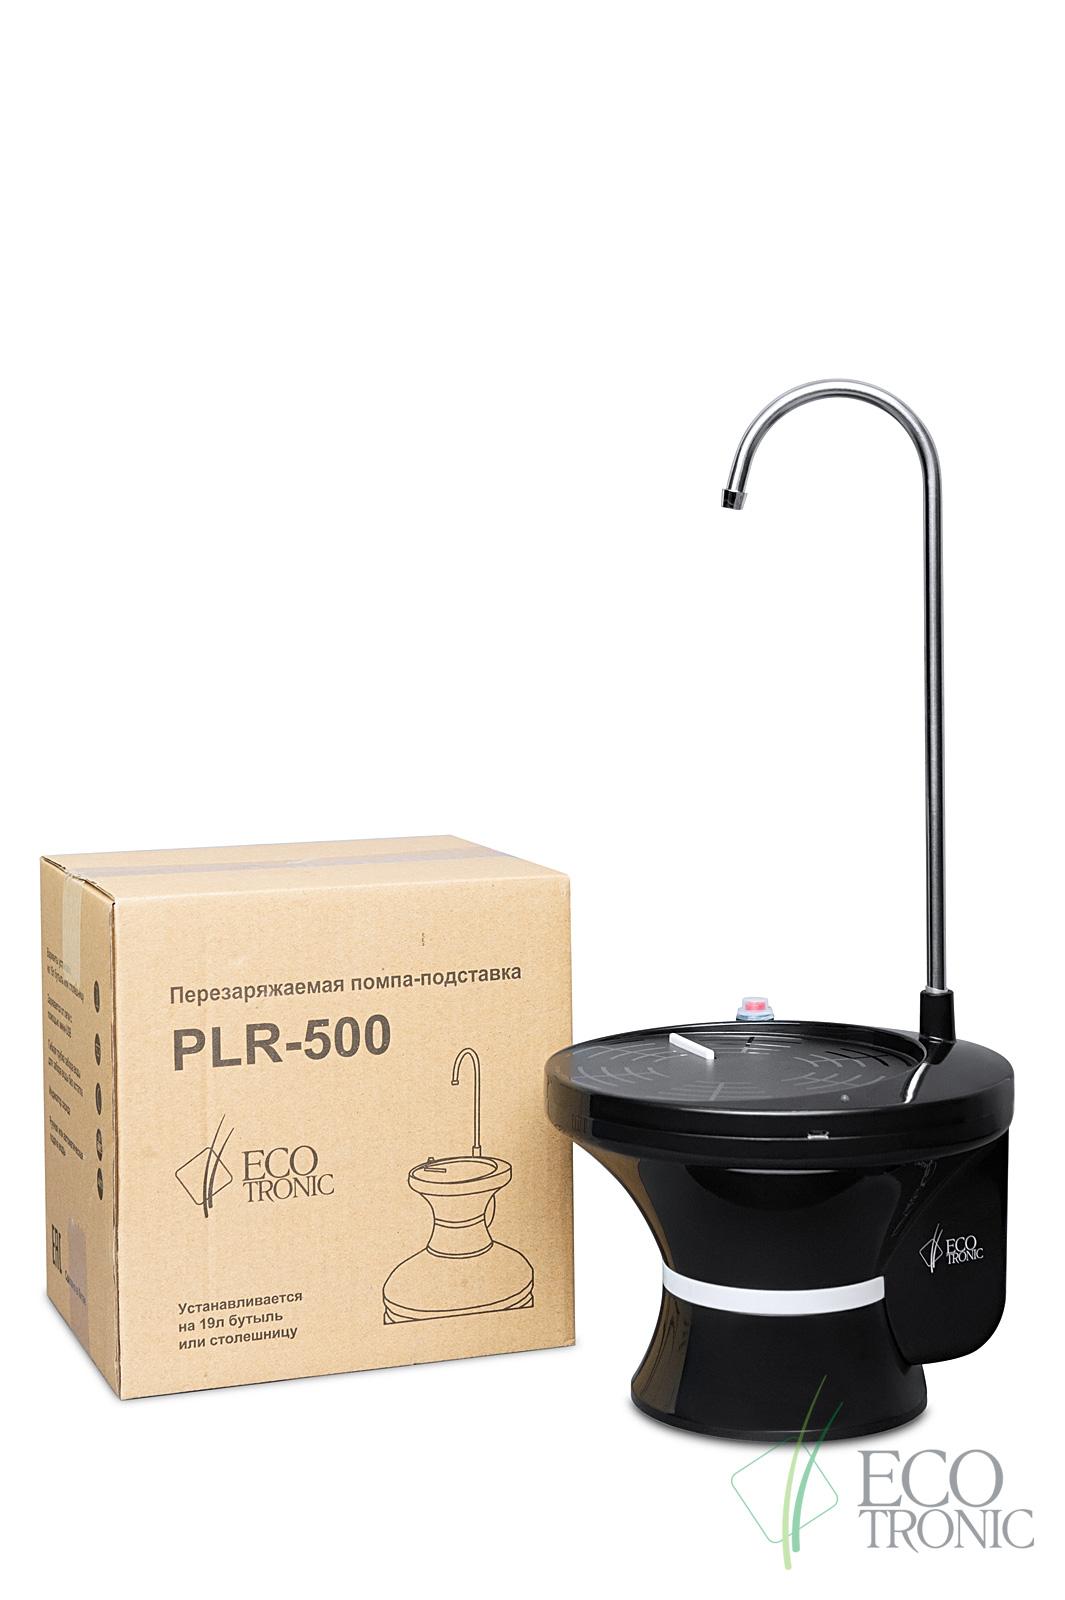 Помпа-подставка Ecotronic PLR-500